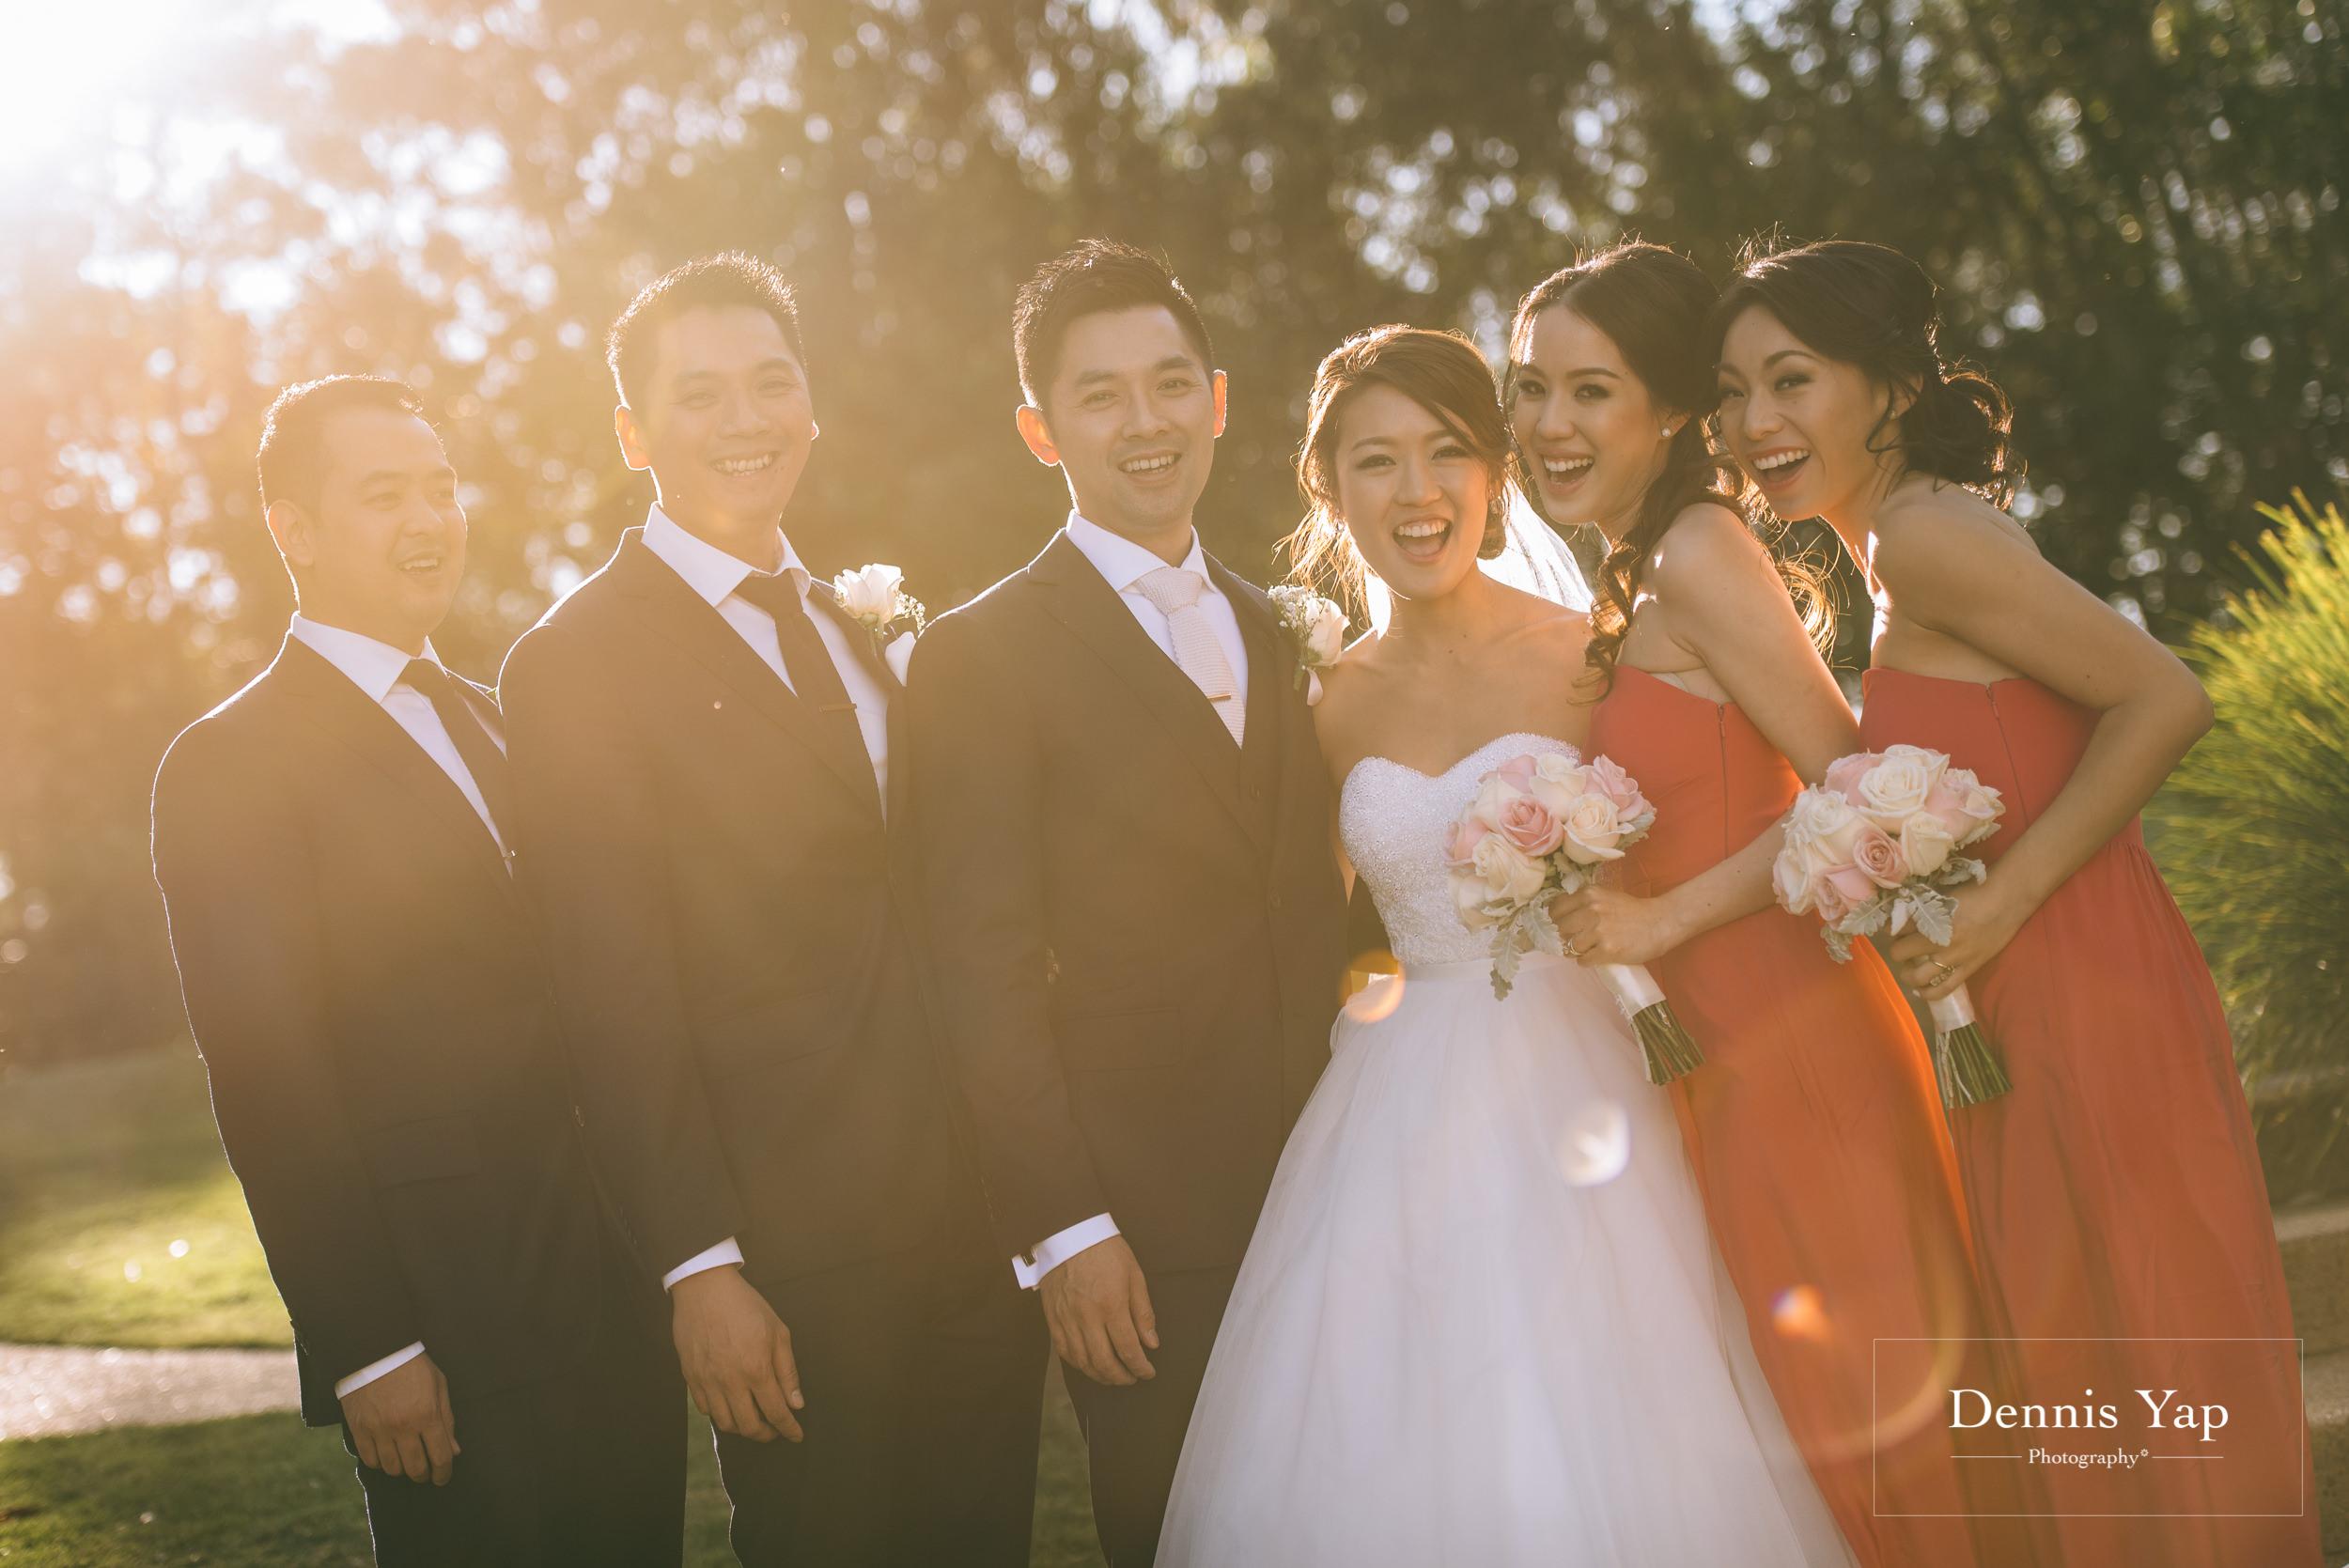 thang veng vietnamese wedding brisbane dennis yap photography malaysia wedding photographer-28.jpg